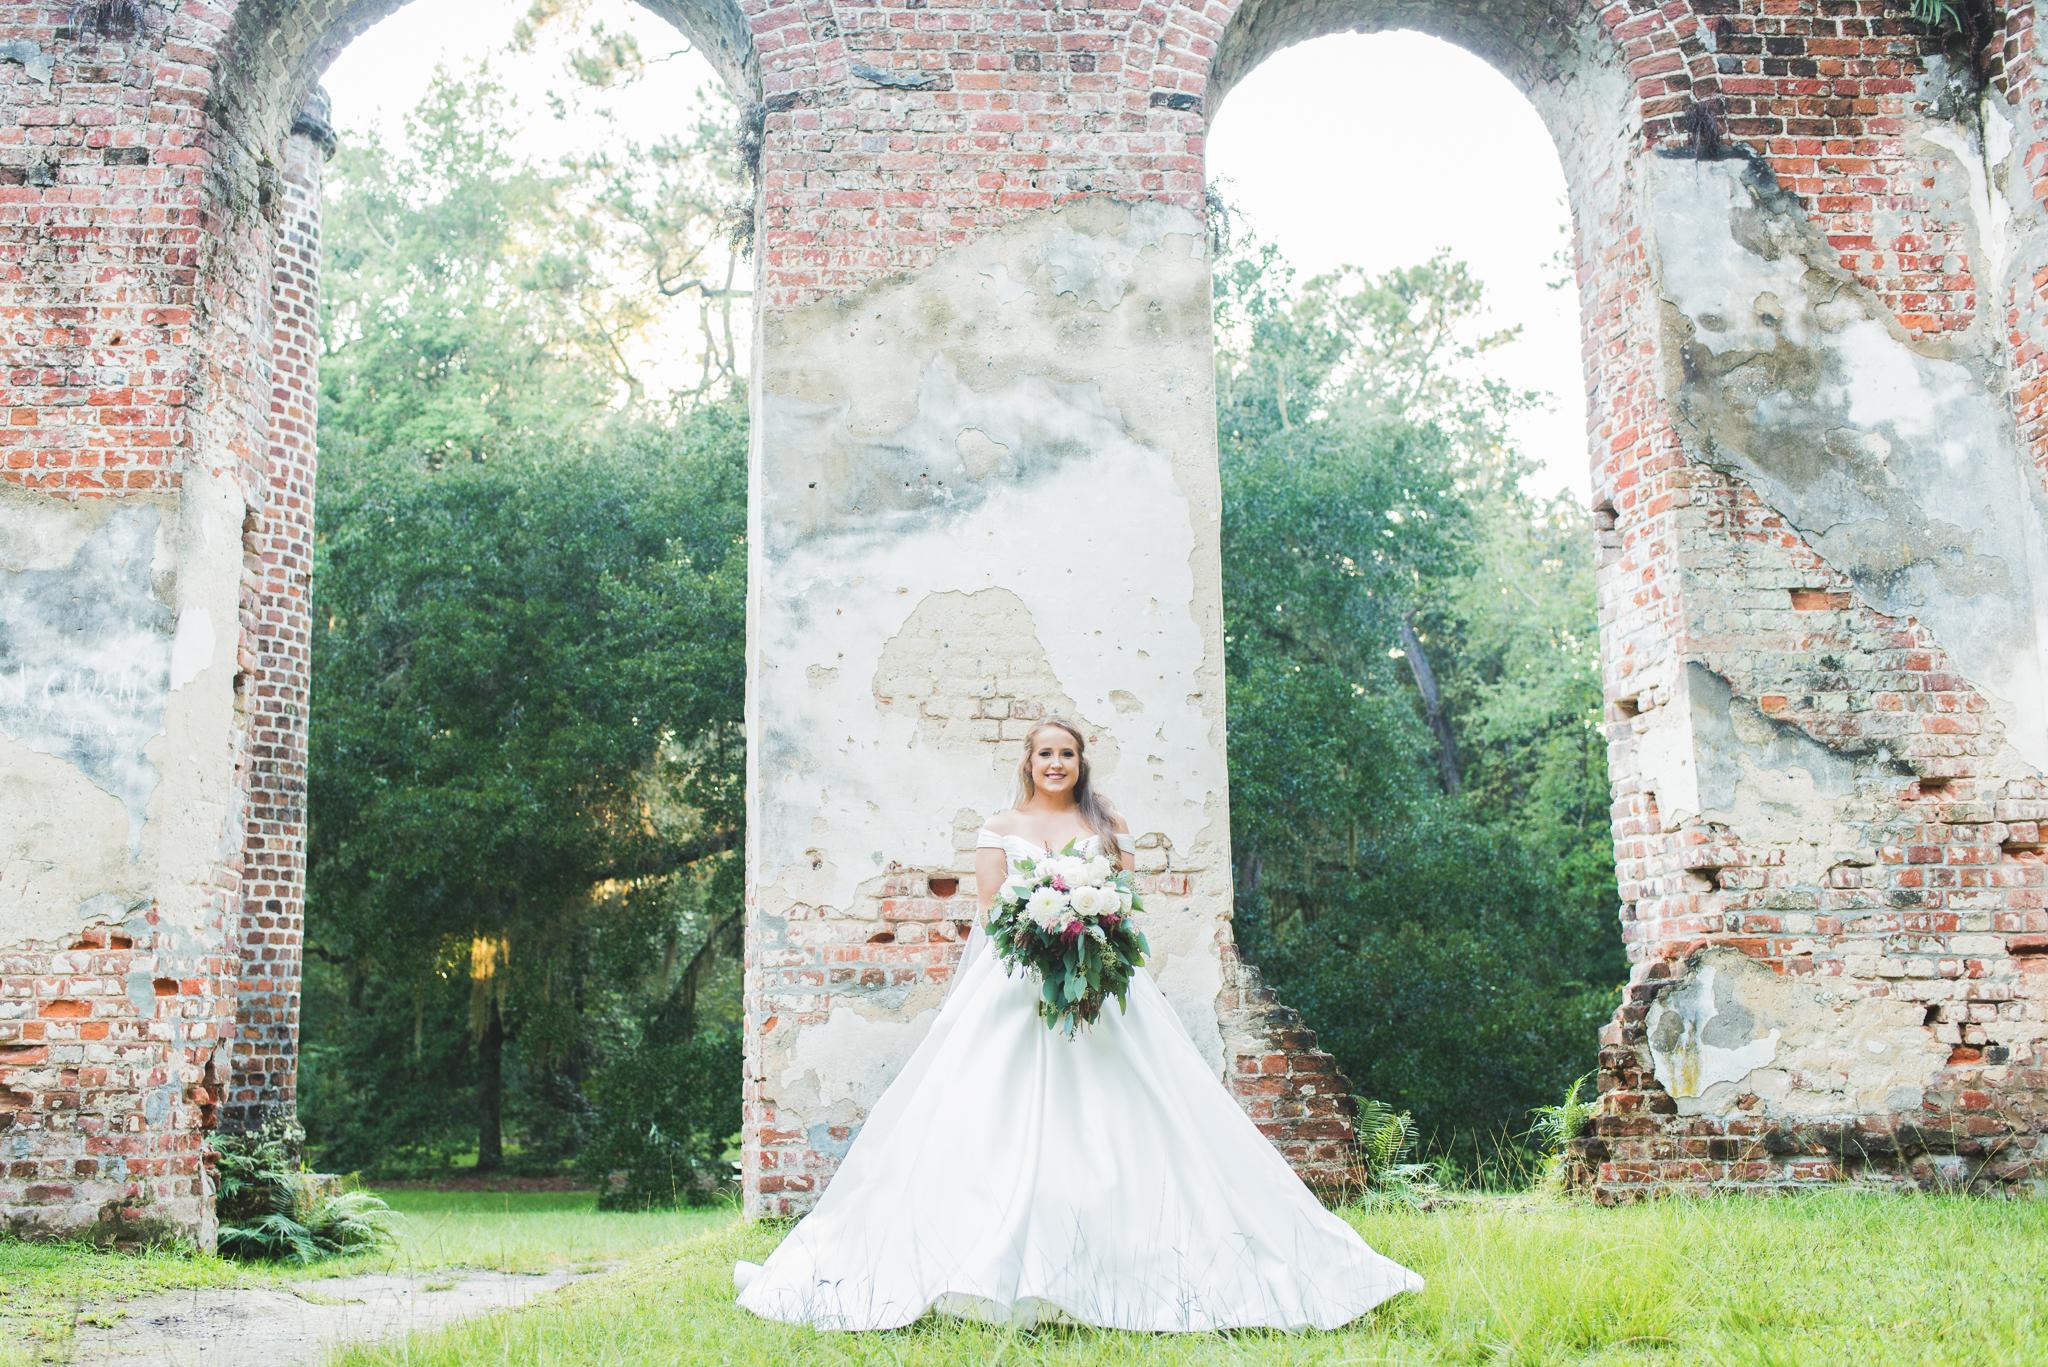 Bridals_AmberRay_blog-4.jpg